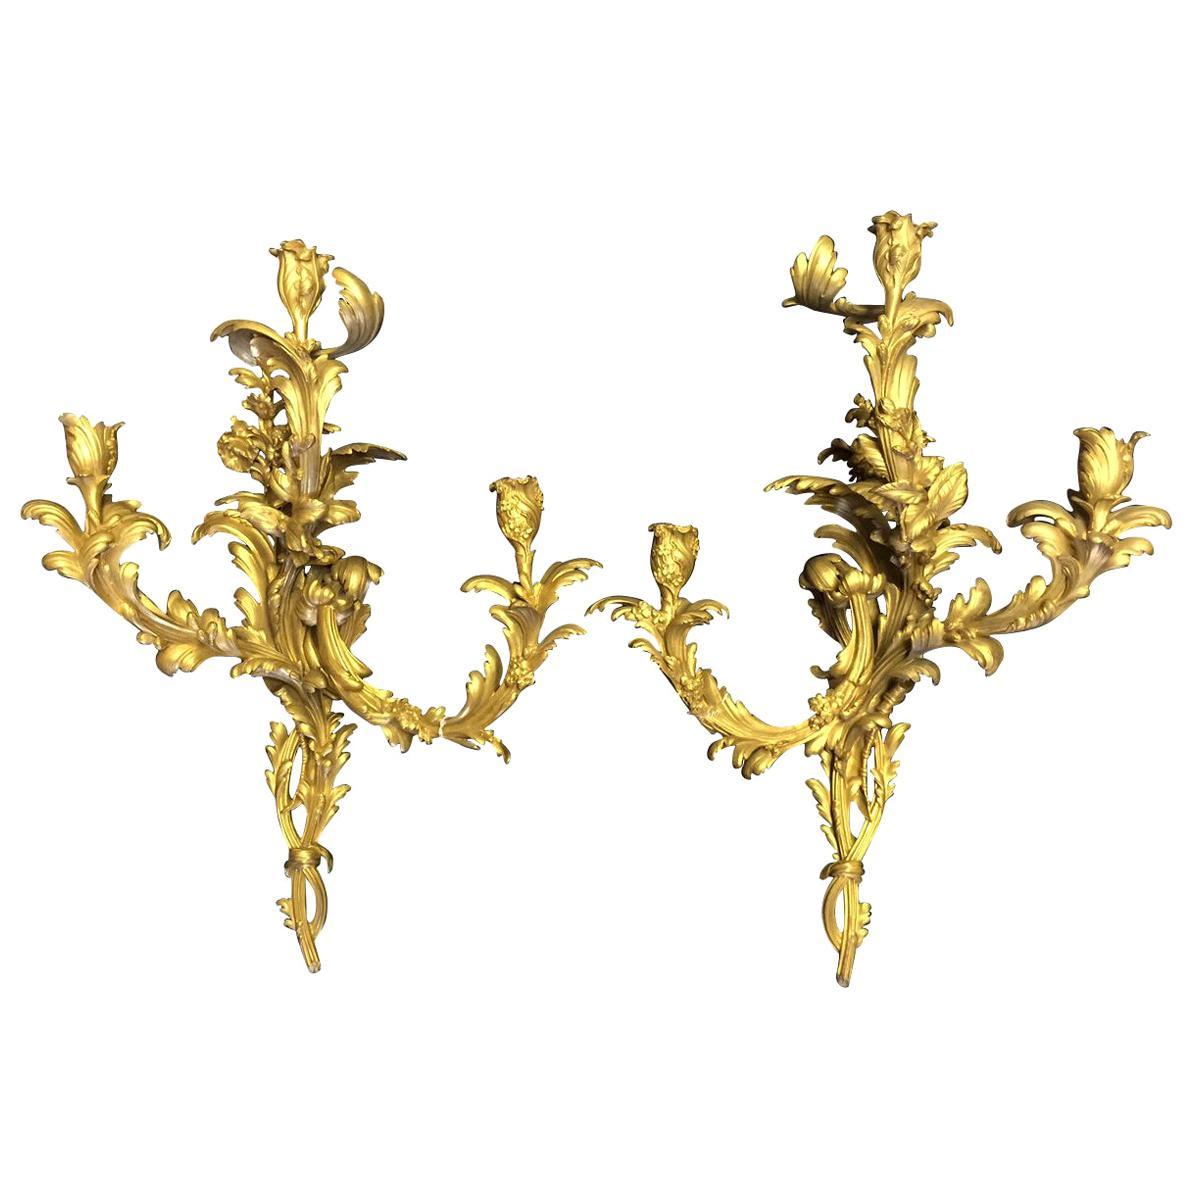 French Louis XV Style Ormolu Sconces, 19th Century